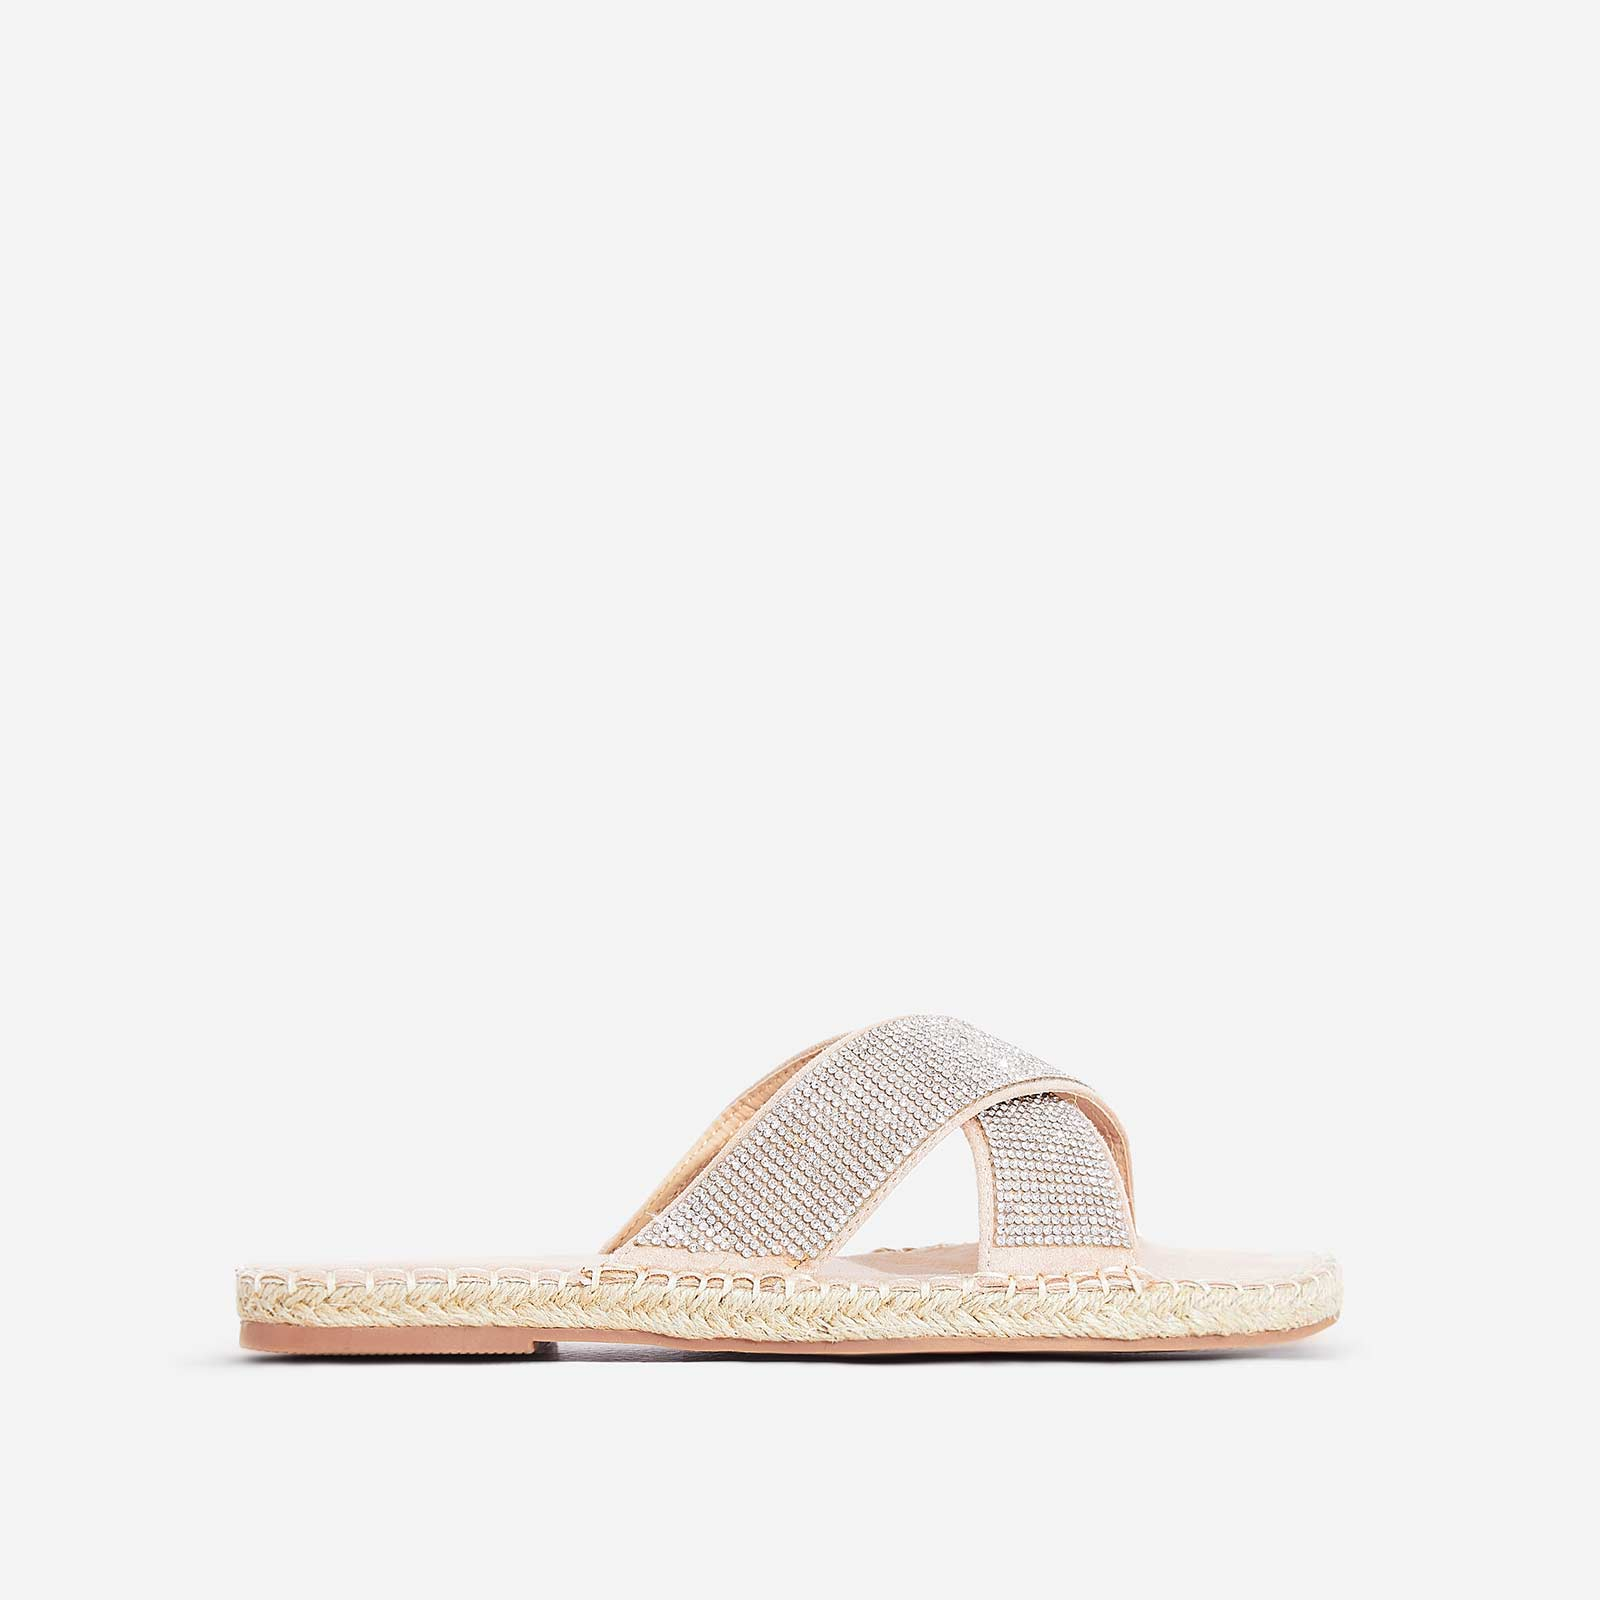 Queen Diamante Detail Espadrille Flat Sandal In Pink Faux Suede